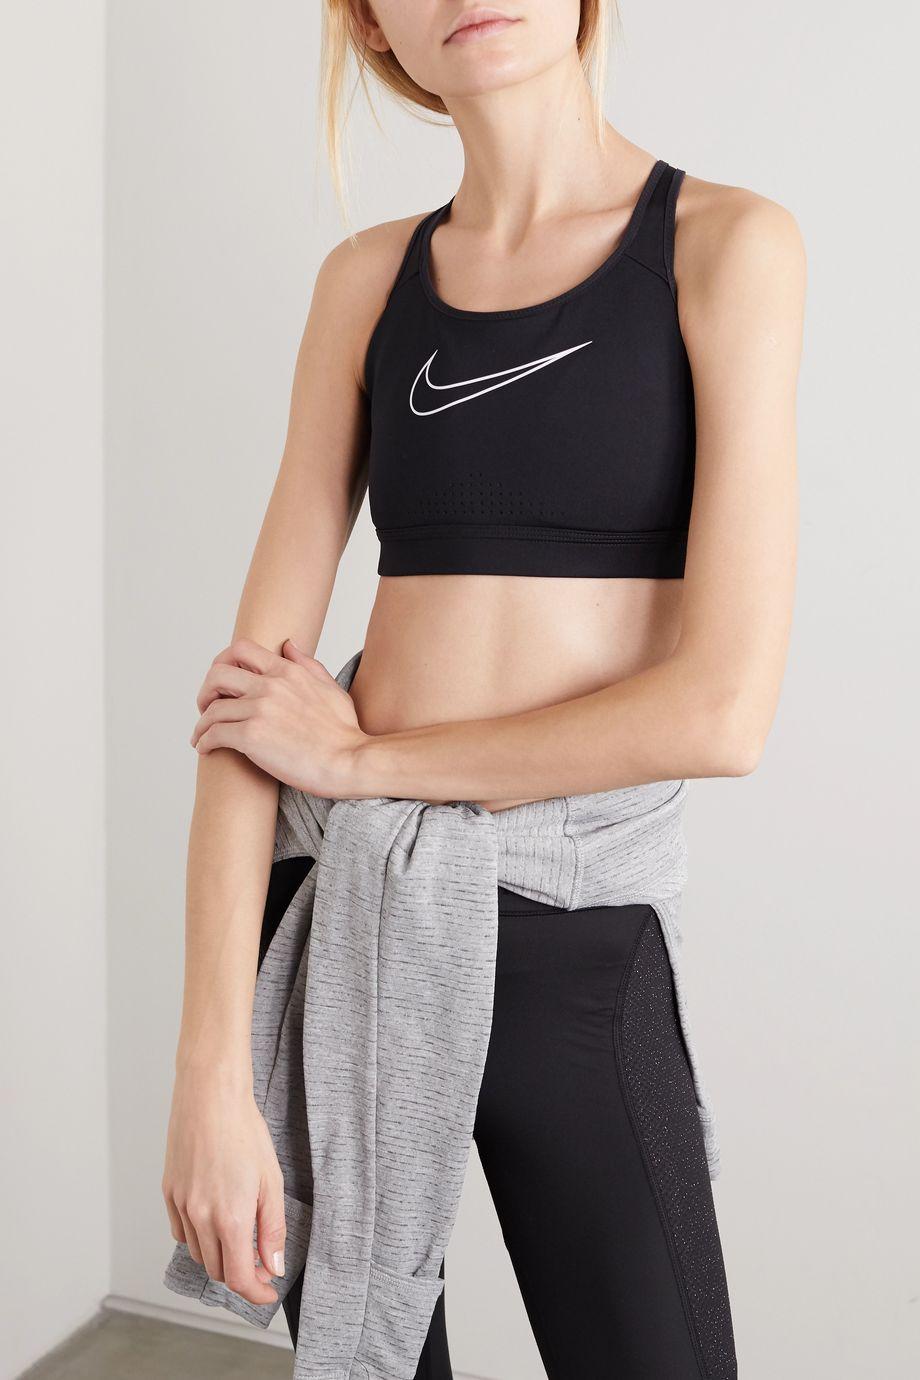 Nike Impact printed Dri-FIT sports bra